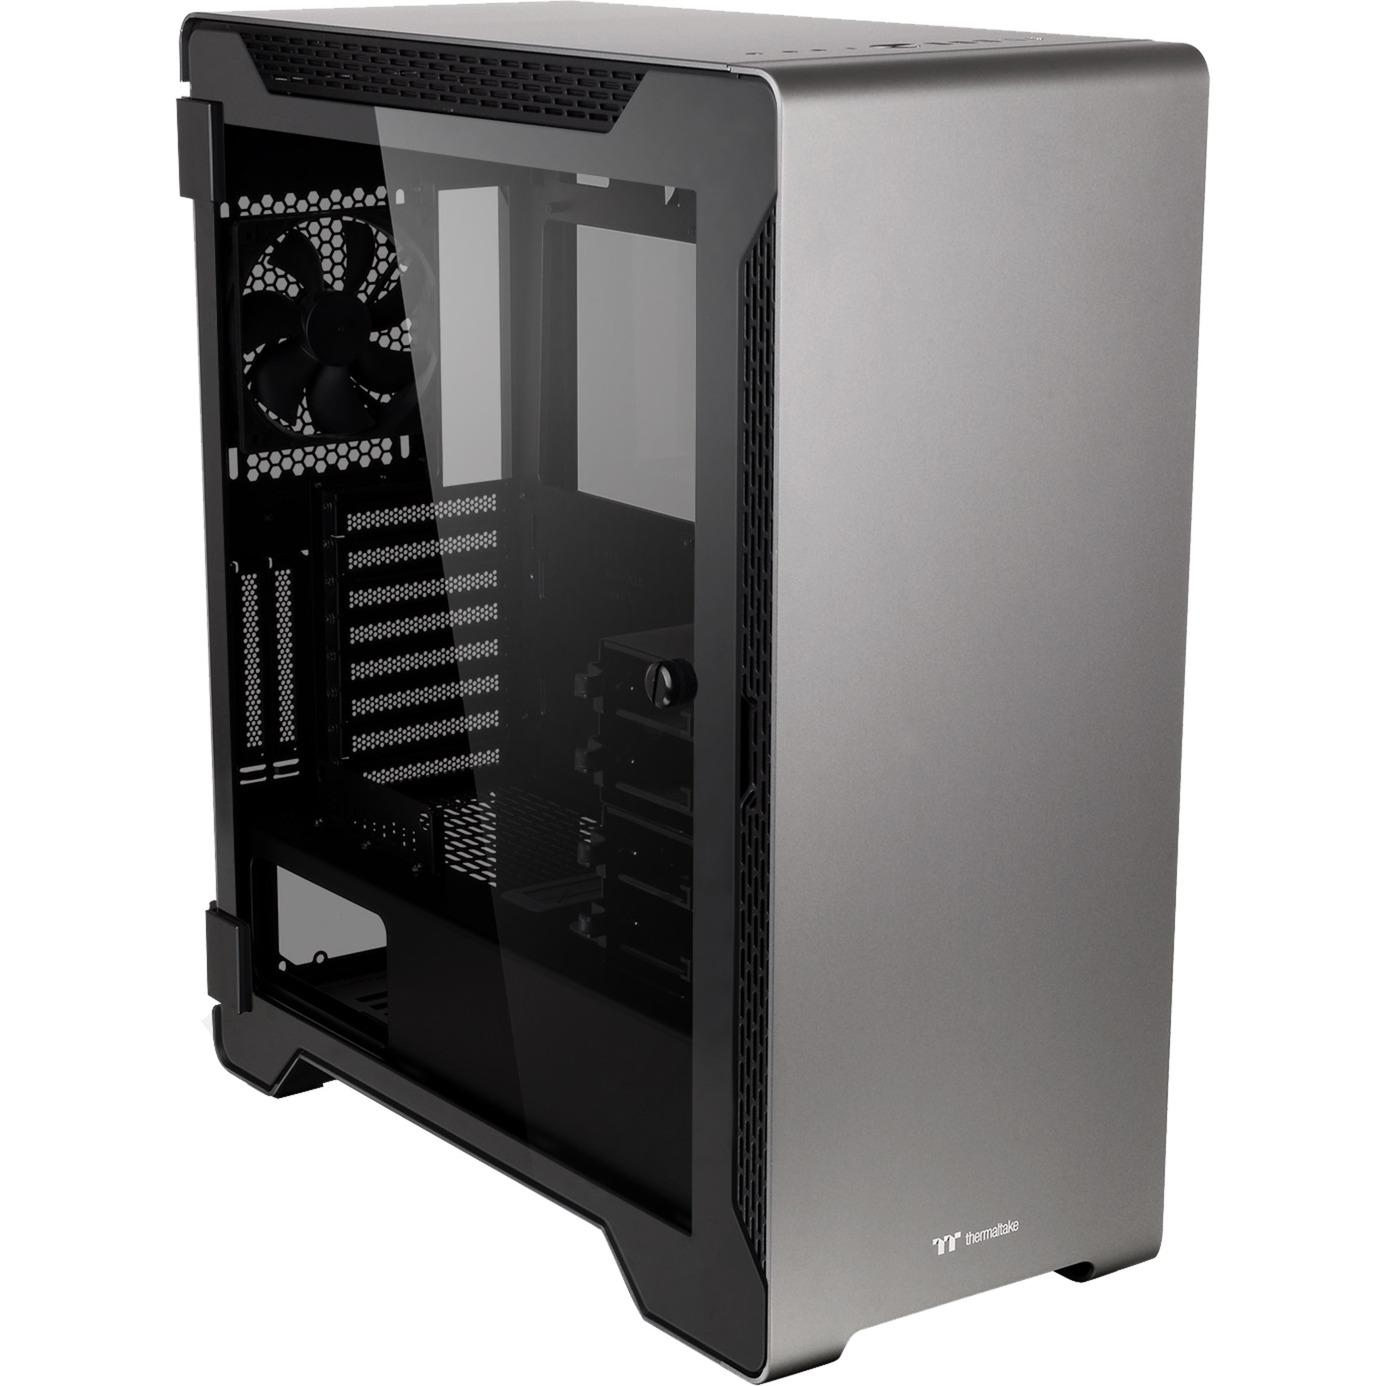 A500 carcasa de ordenador Midi-Tower Negro, Gris, Cajas de torre